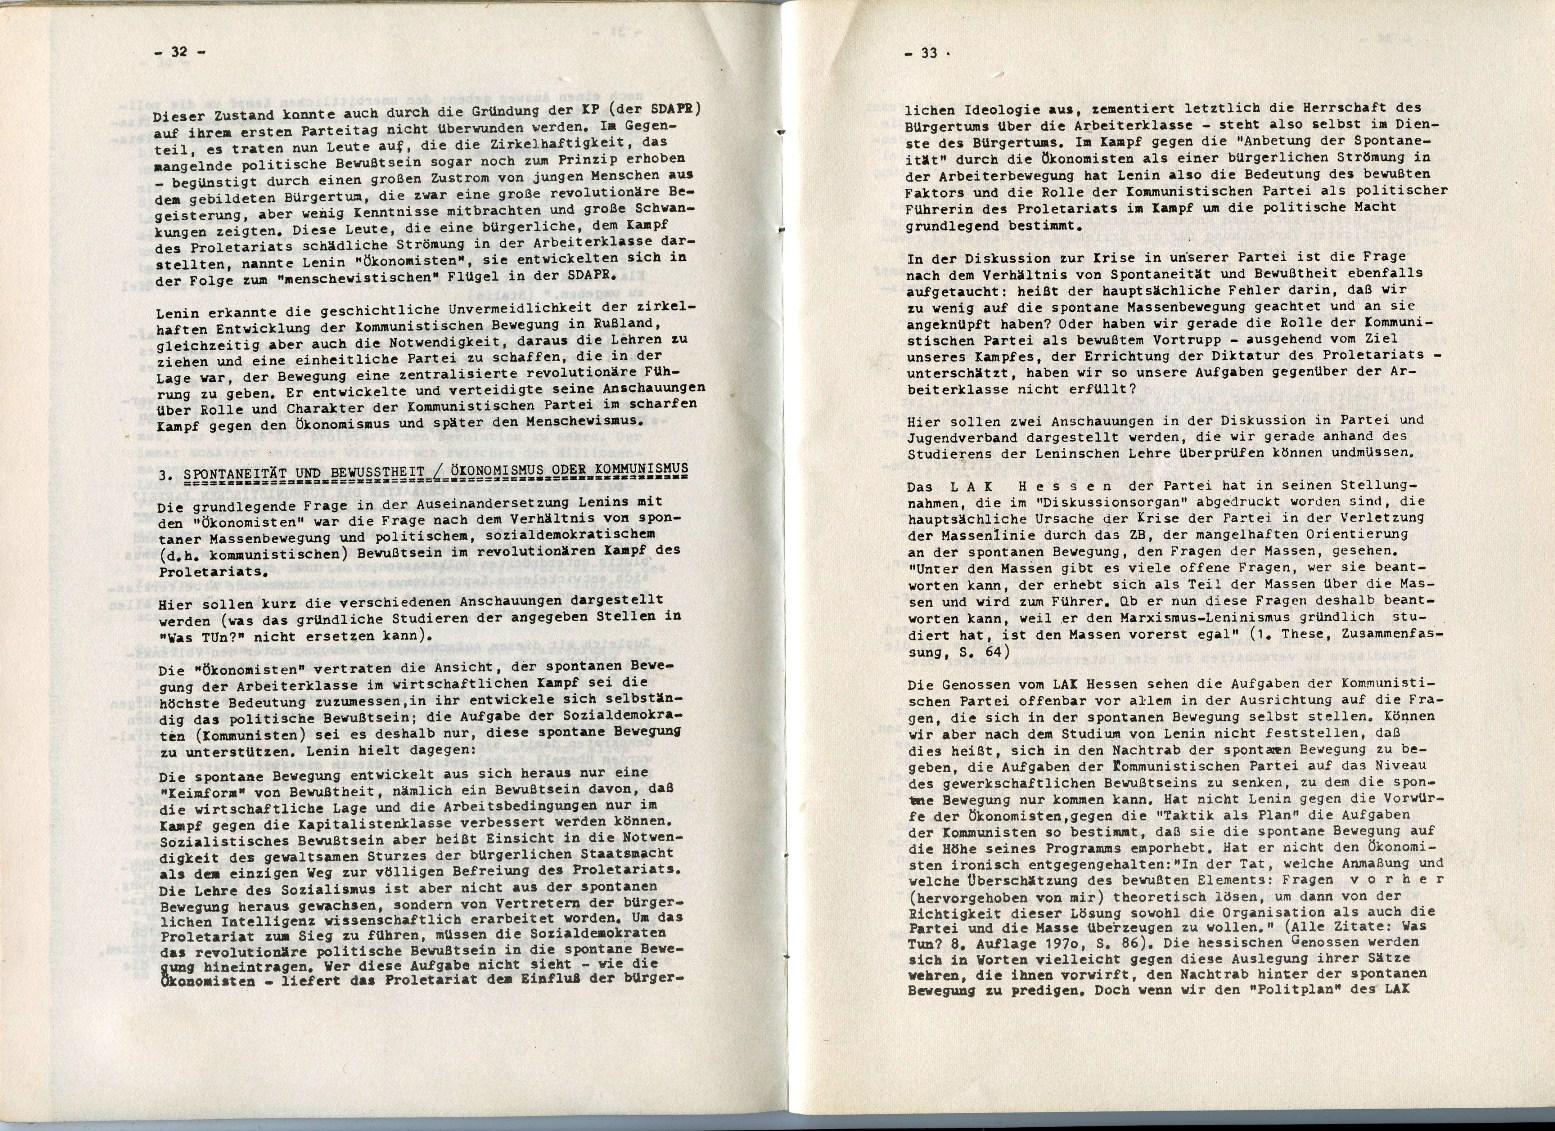 ZB_Universitas_1972_20